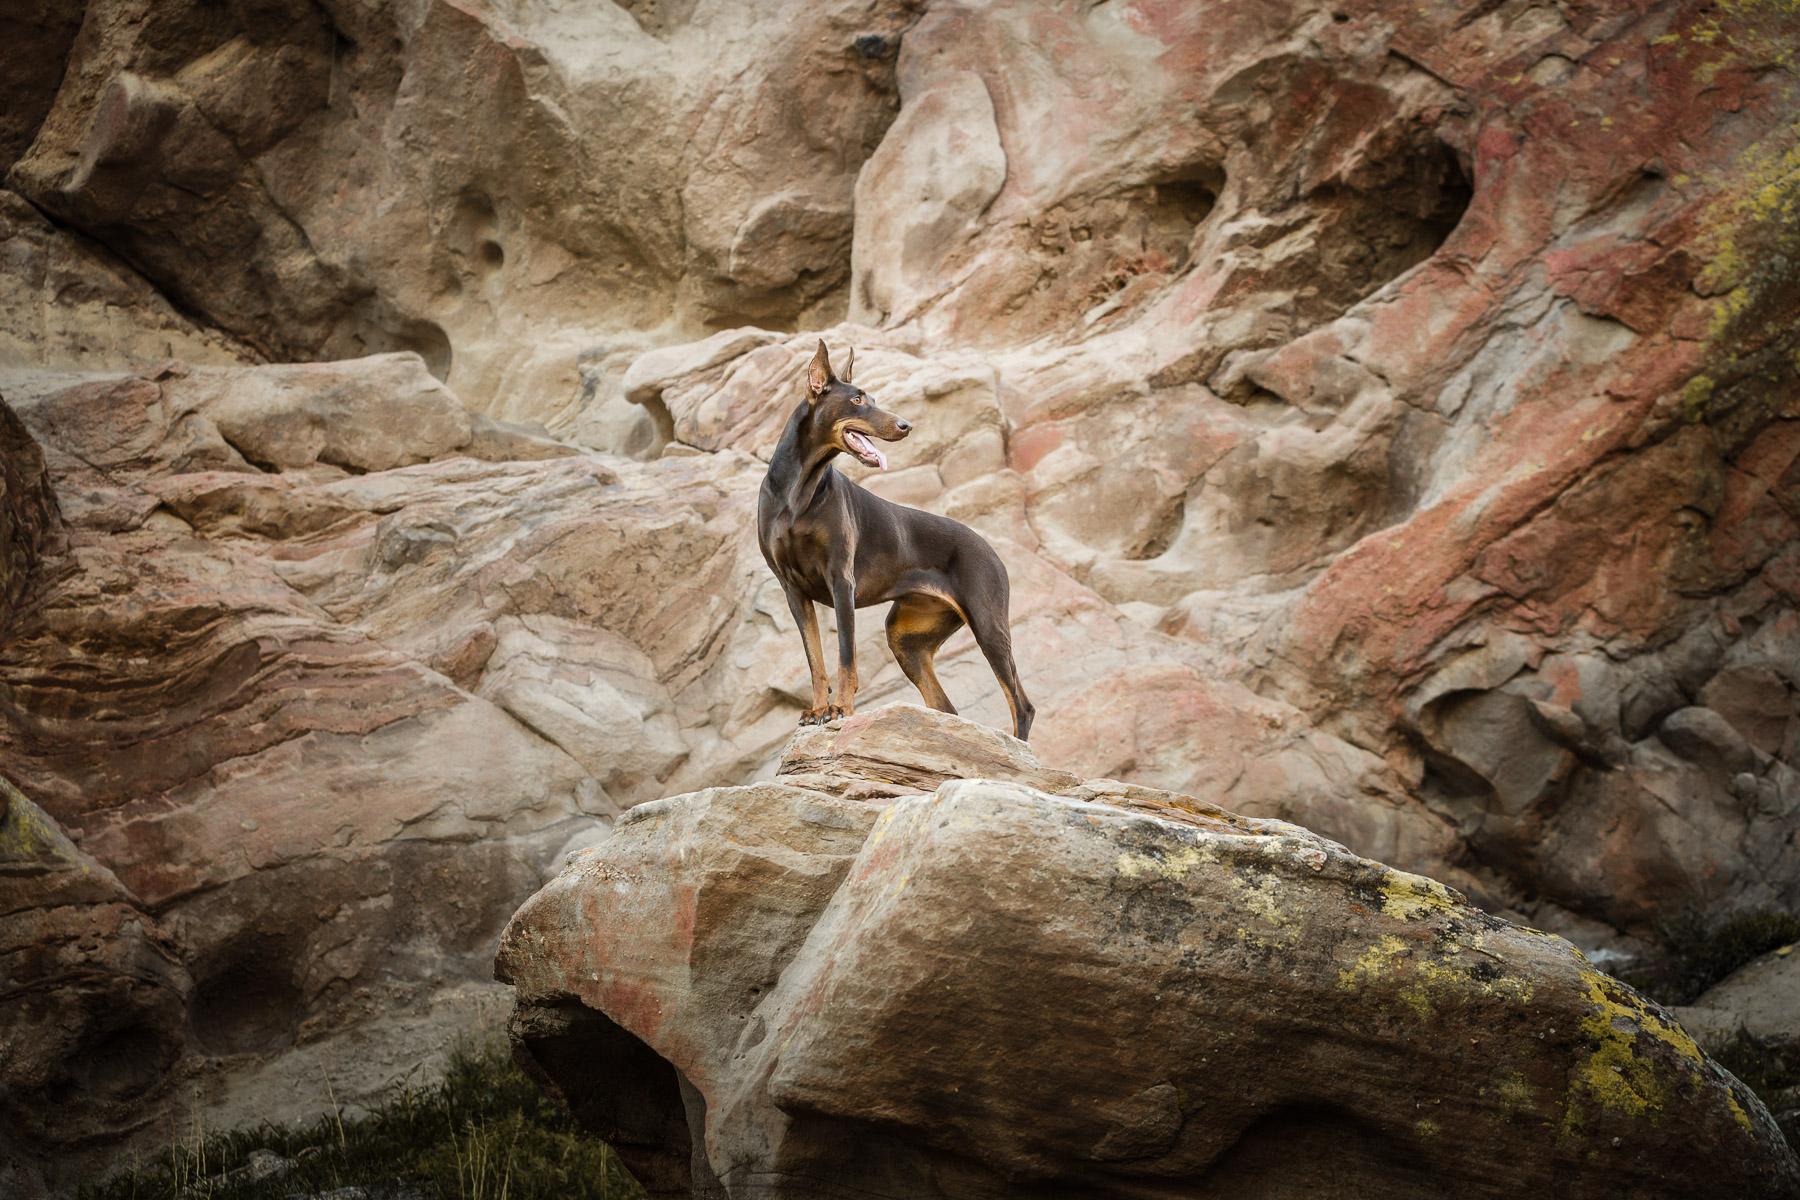 commercial-dog-photographer-doberman-on-rock-epic-photo.jpg